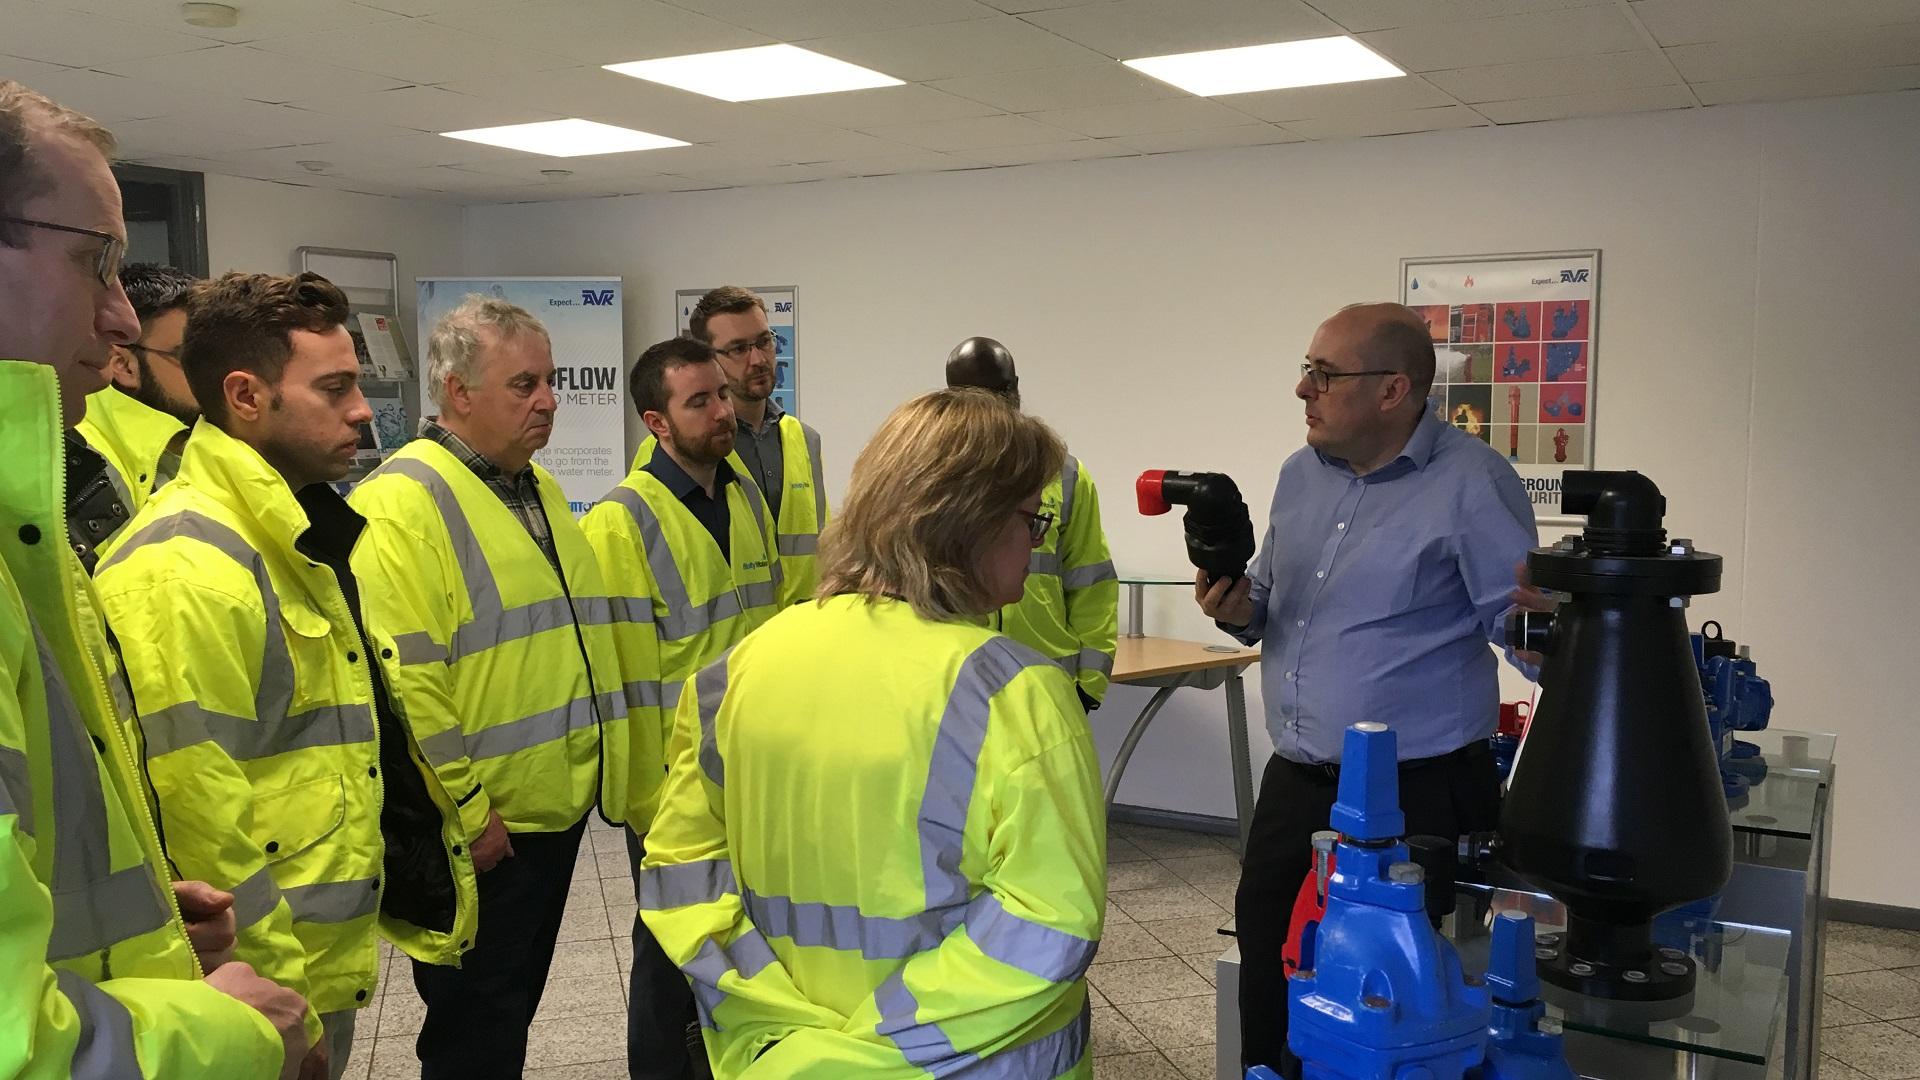 WSP Global Training and AVK Factory visit Stuart with AVK Air valves